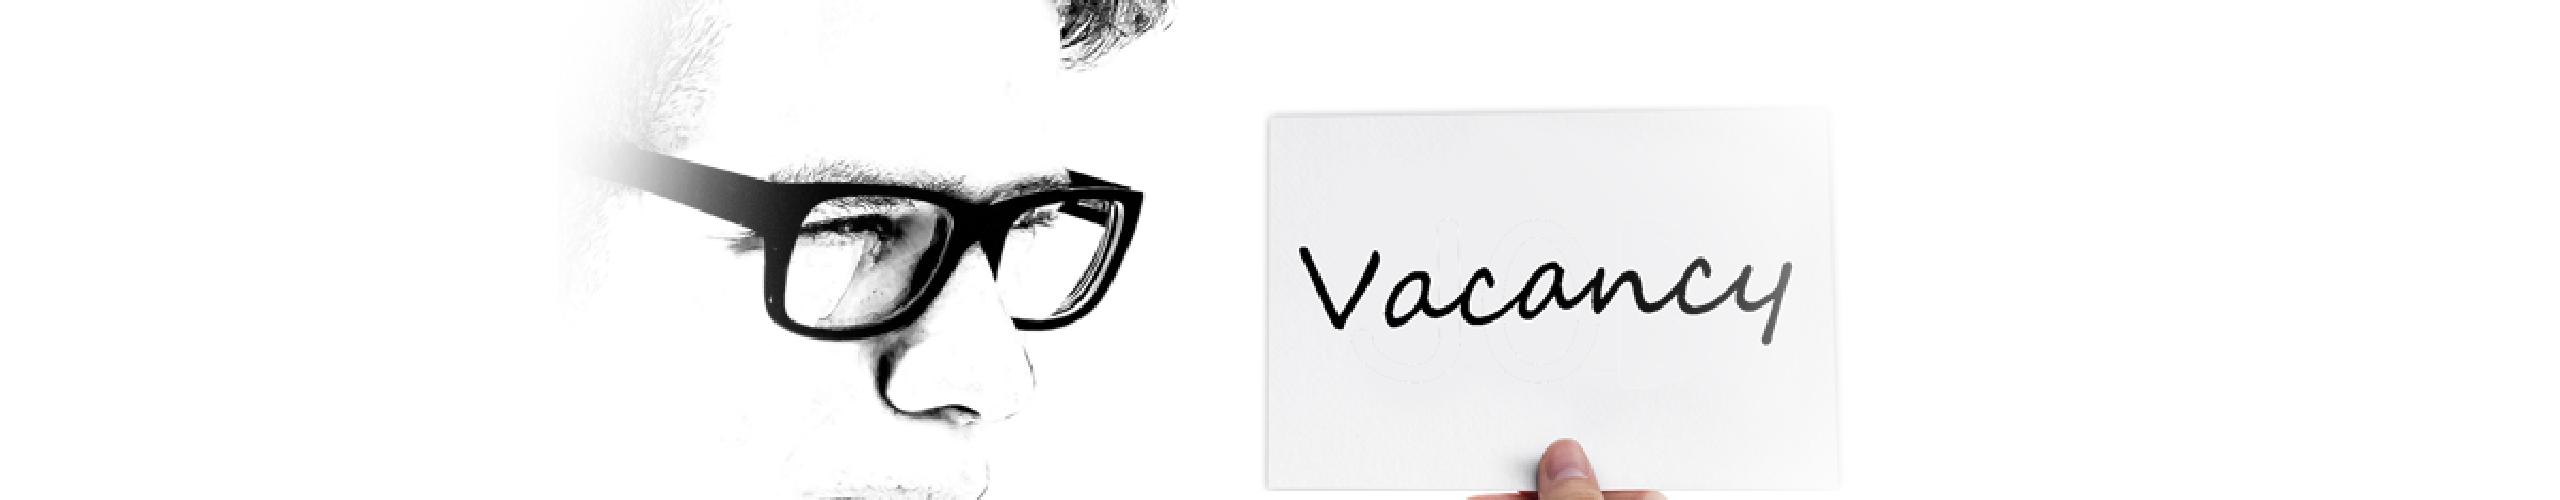 Vacancy panel background